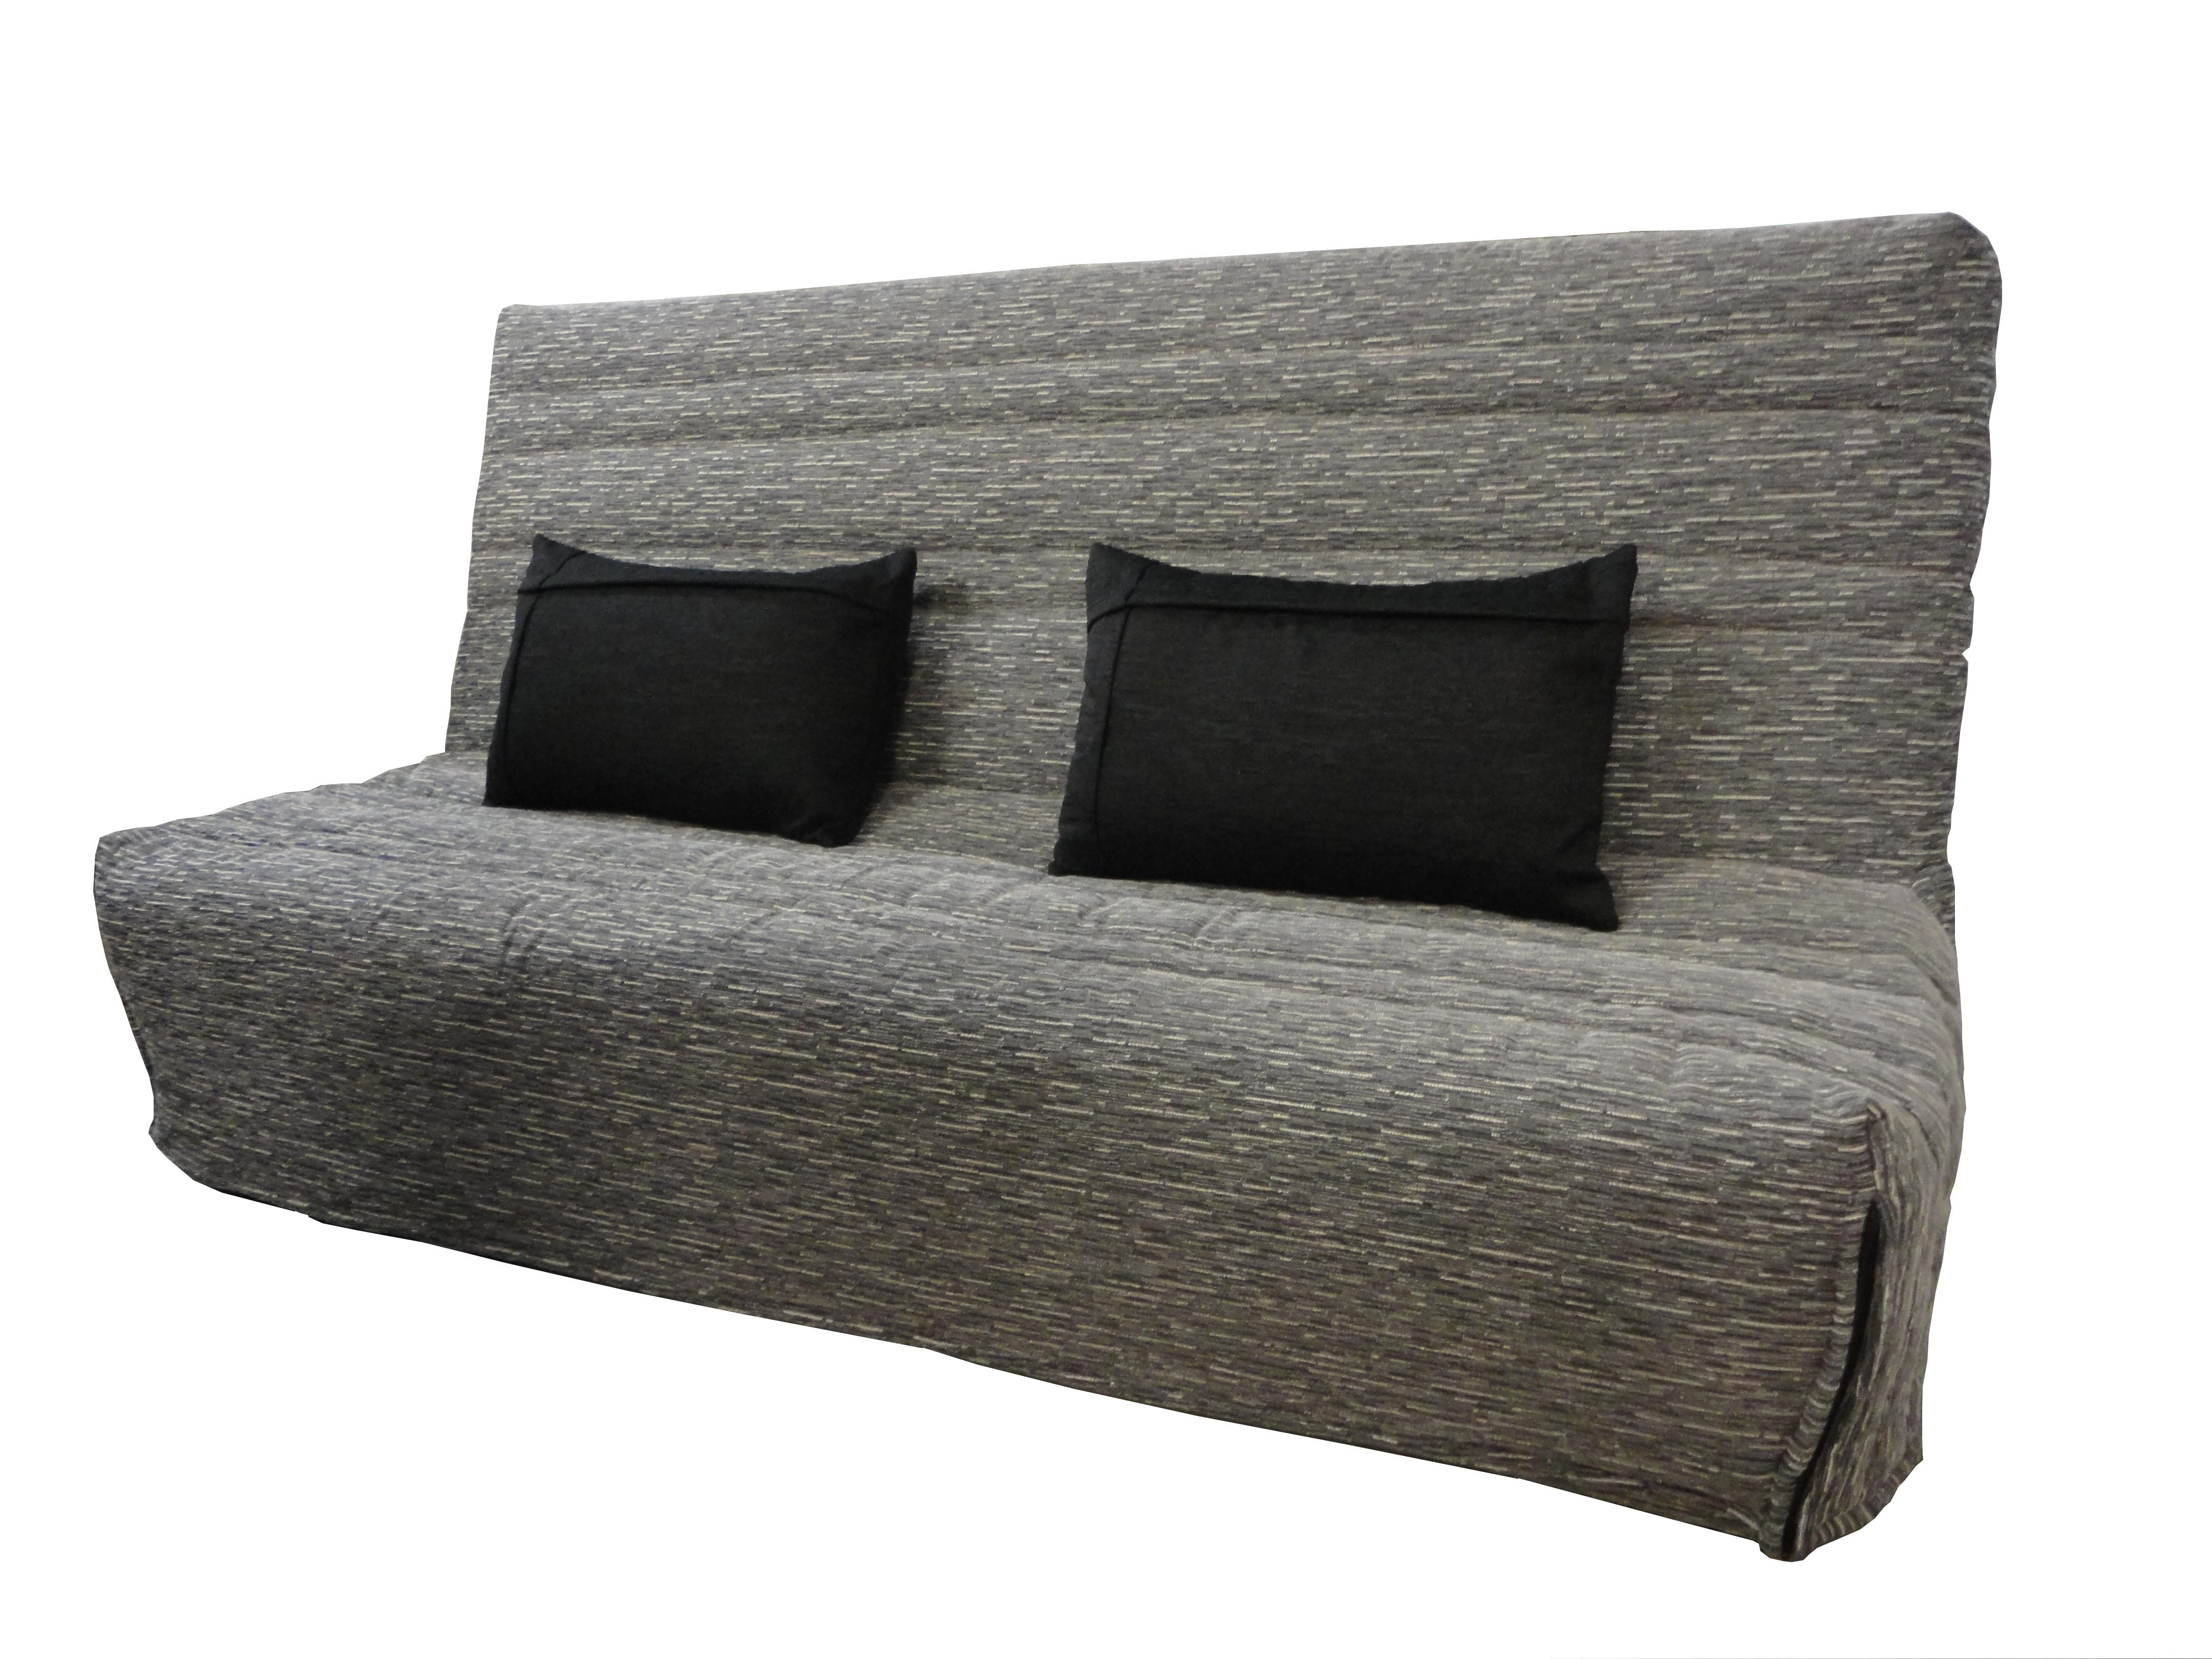 bz clic clac gamme nad urban confort nice. Black Bedroom Furniture Sets. Home Design Ideas